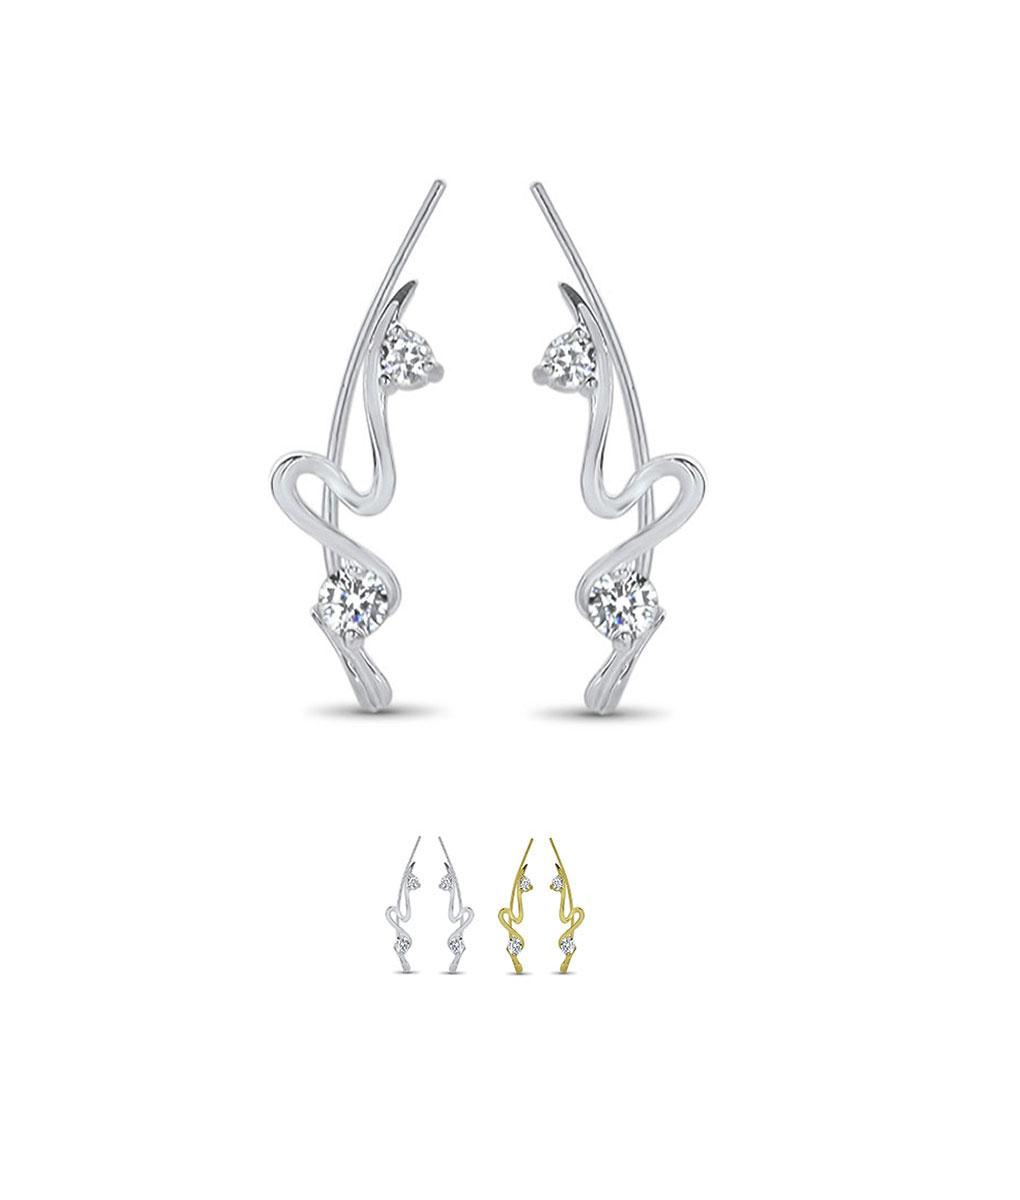 925 Sterling Silver Or 18k Gold Plated Ear Crawler Vine Sweep Earrings